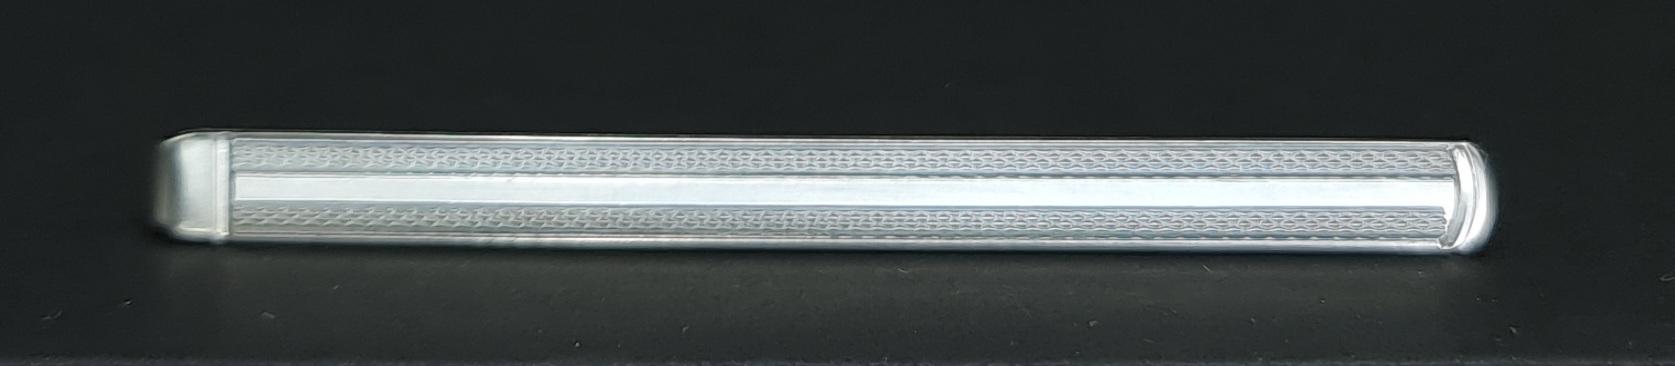 dasspeld 835 zilver tie clip 835 silver hallemark rj silver tie clip dasspeld stempel rj massief zilveren dasspeld massief zilver gehalte 835 zilveren dasschuif massief zilver das speld skoander.com